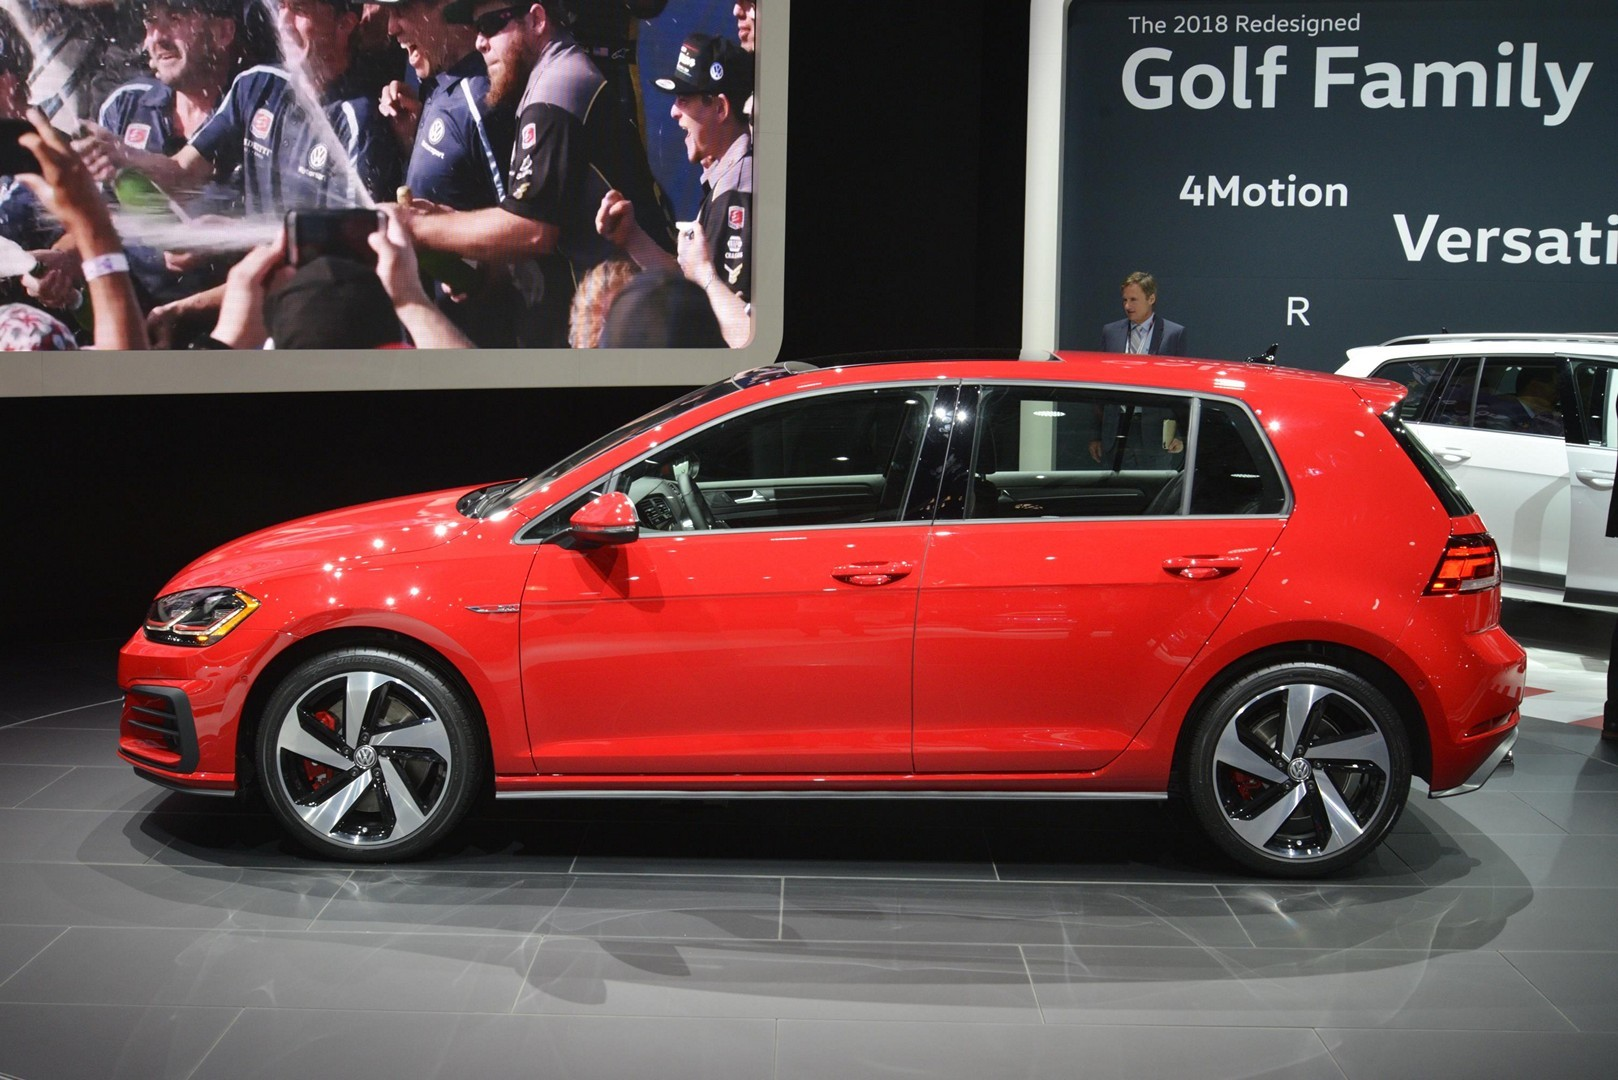 U.S.-spec 2018 Golf GTI Facelift Brings Manual Handbrake and Analog Dials to NY - autoevolution